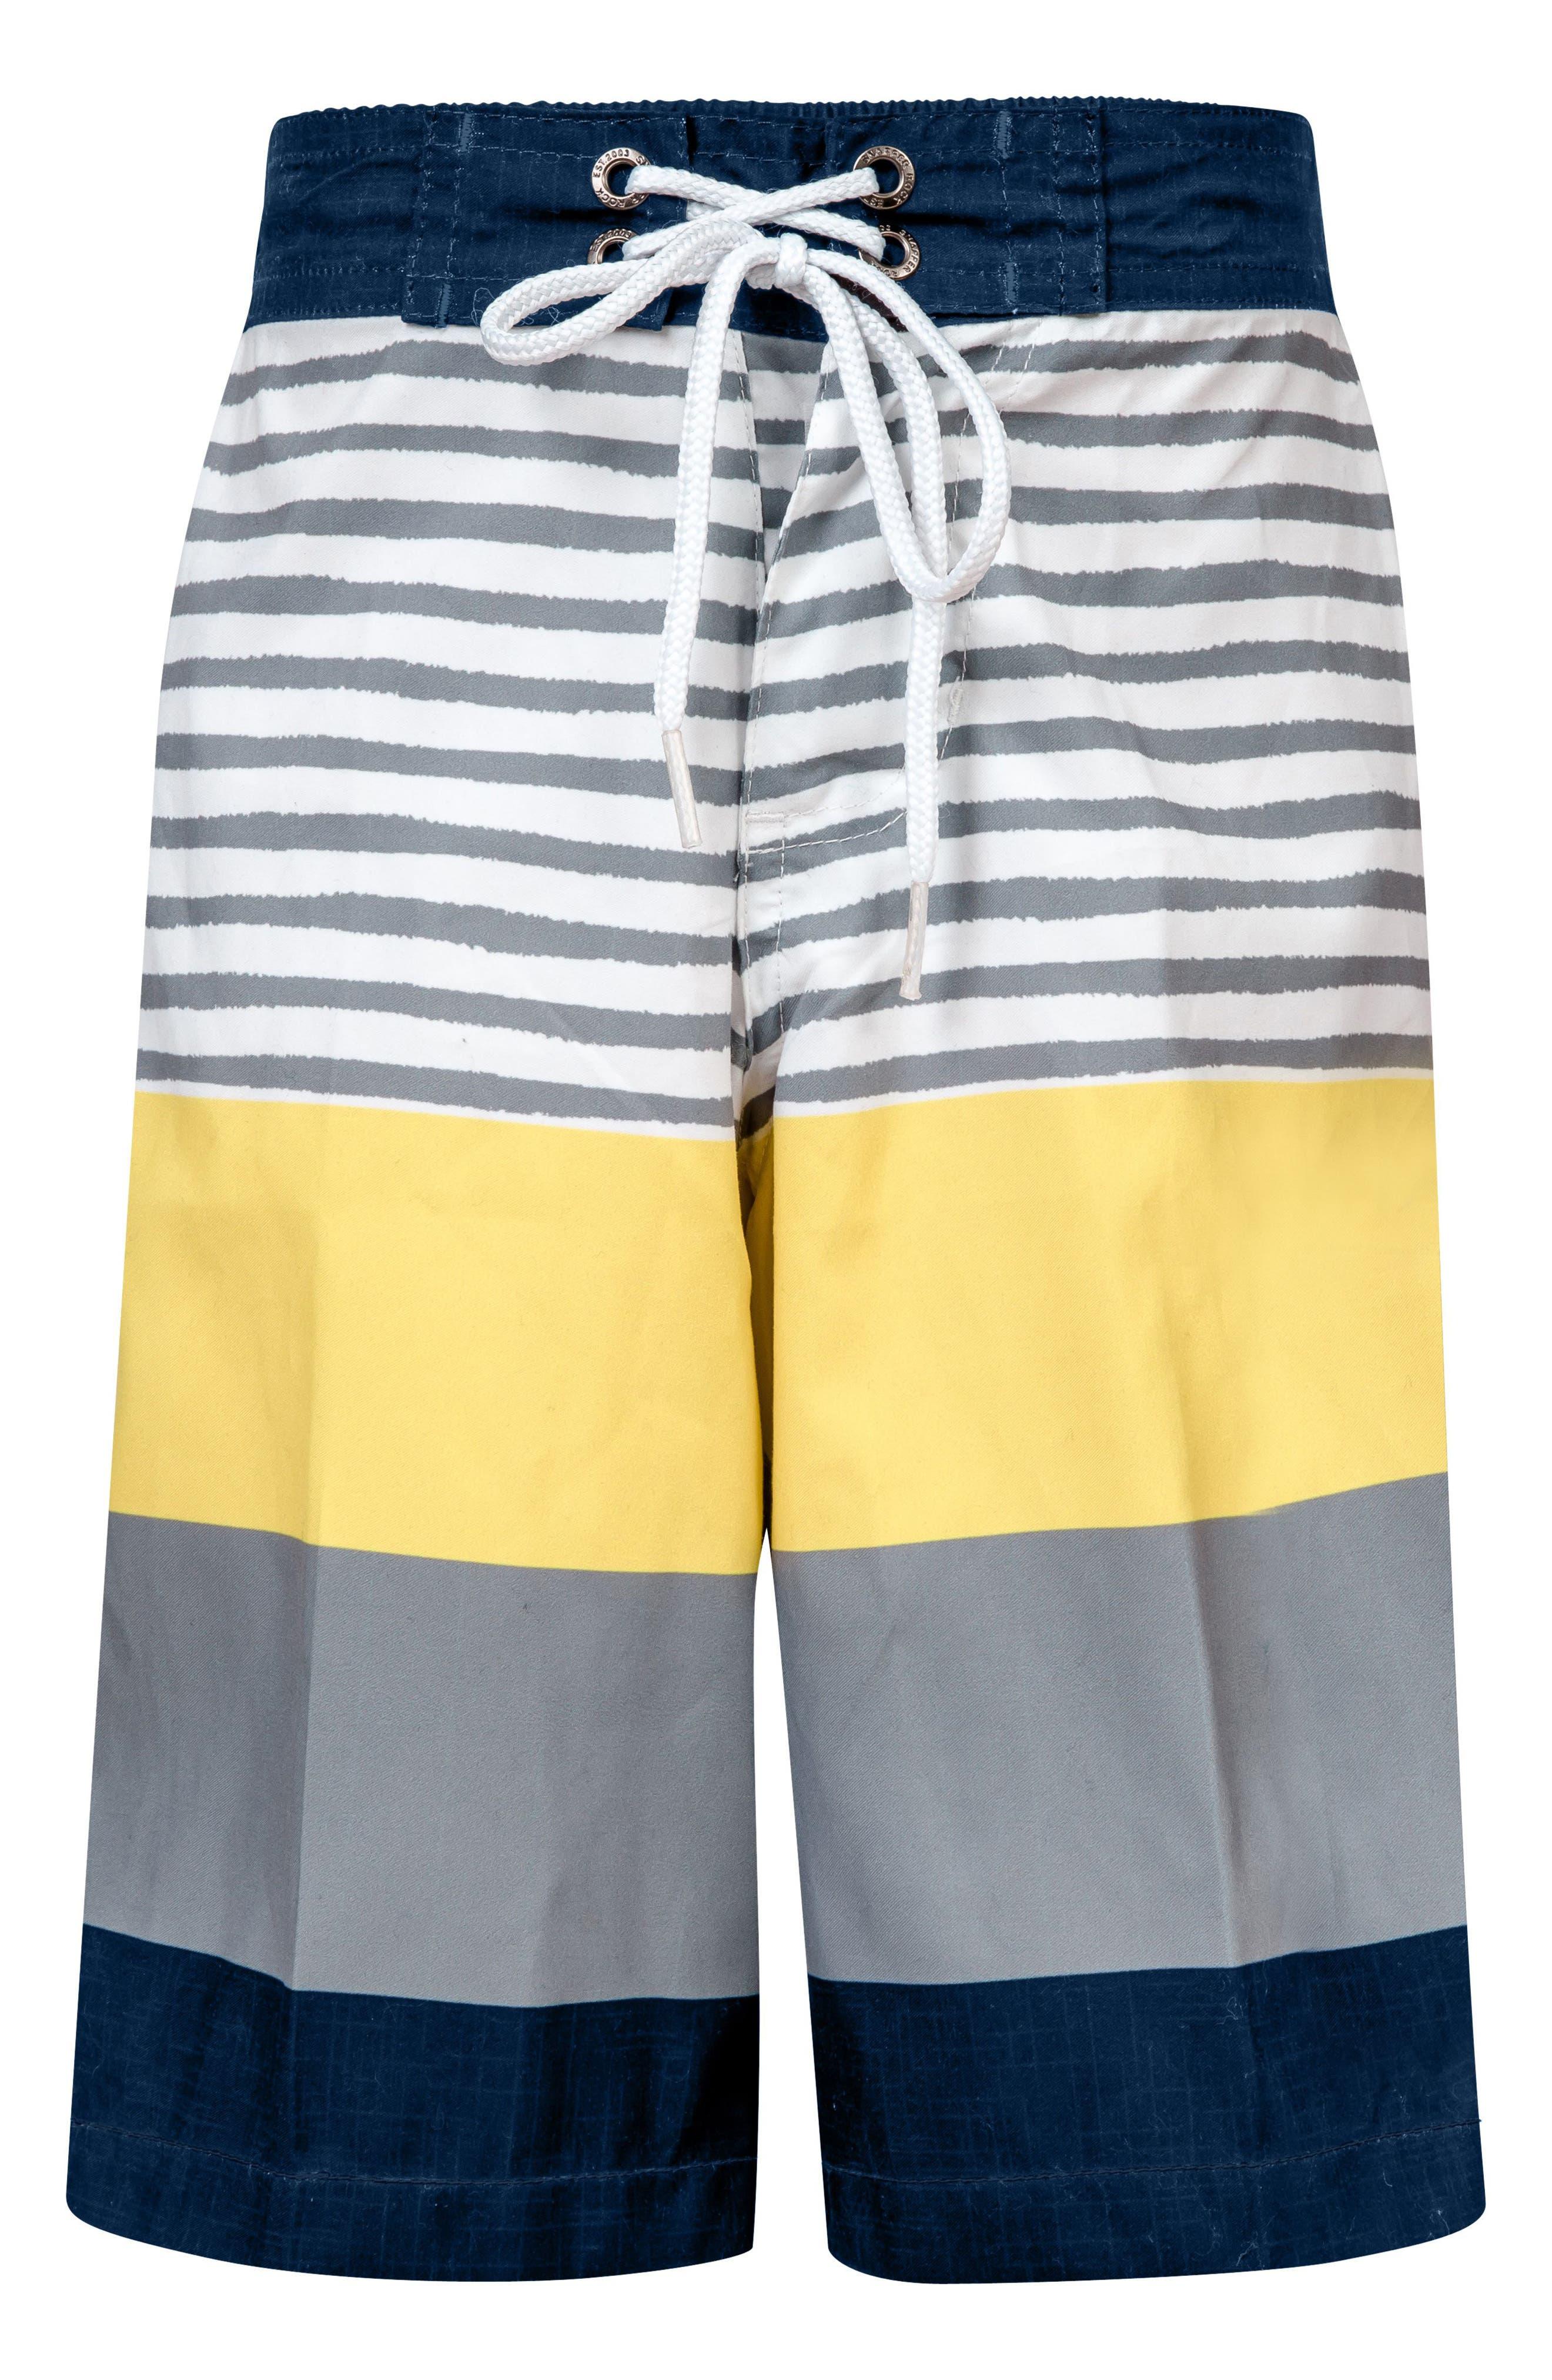 Stripe Board Shorts,                             Main thumbnail 1, color,                             400